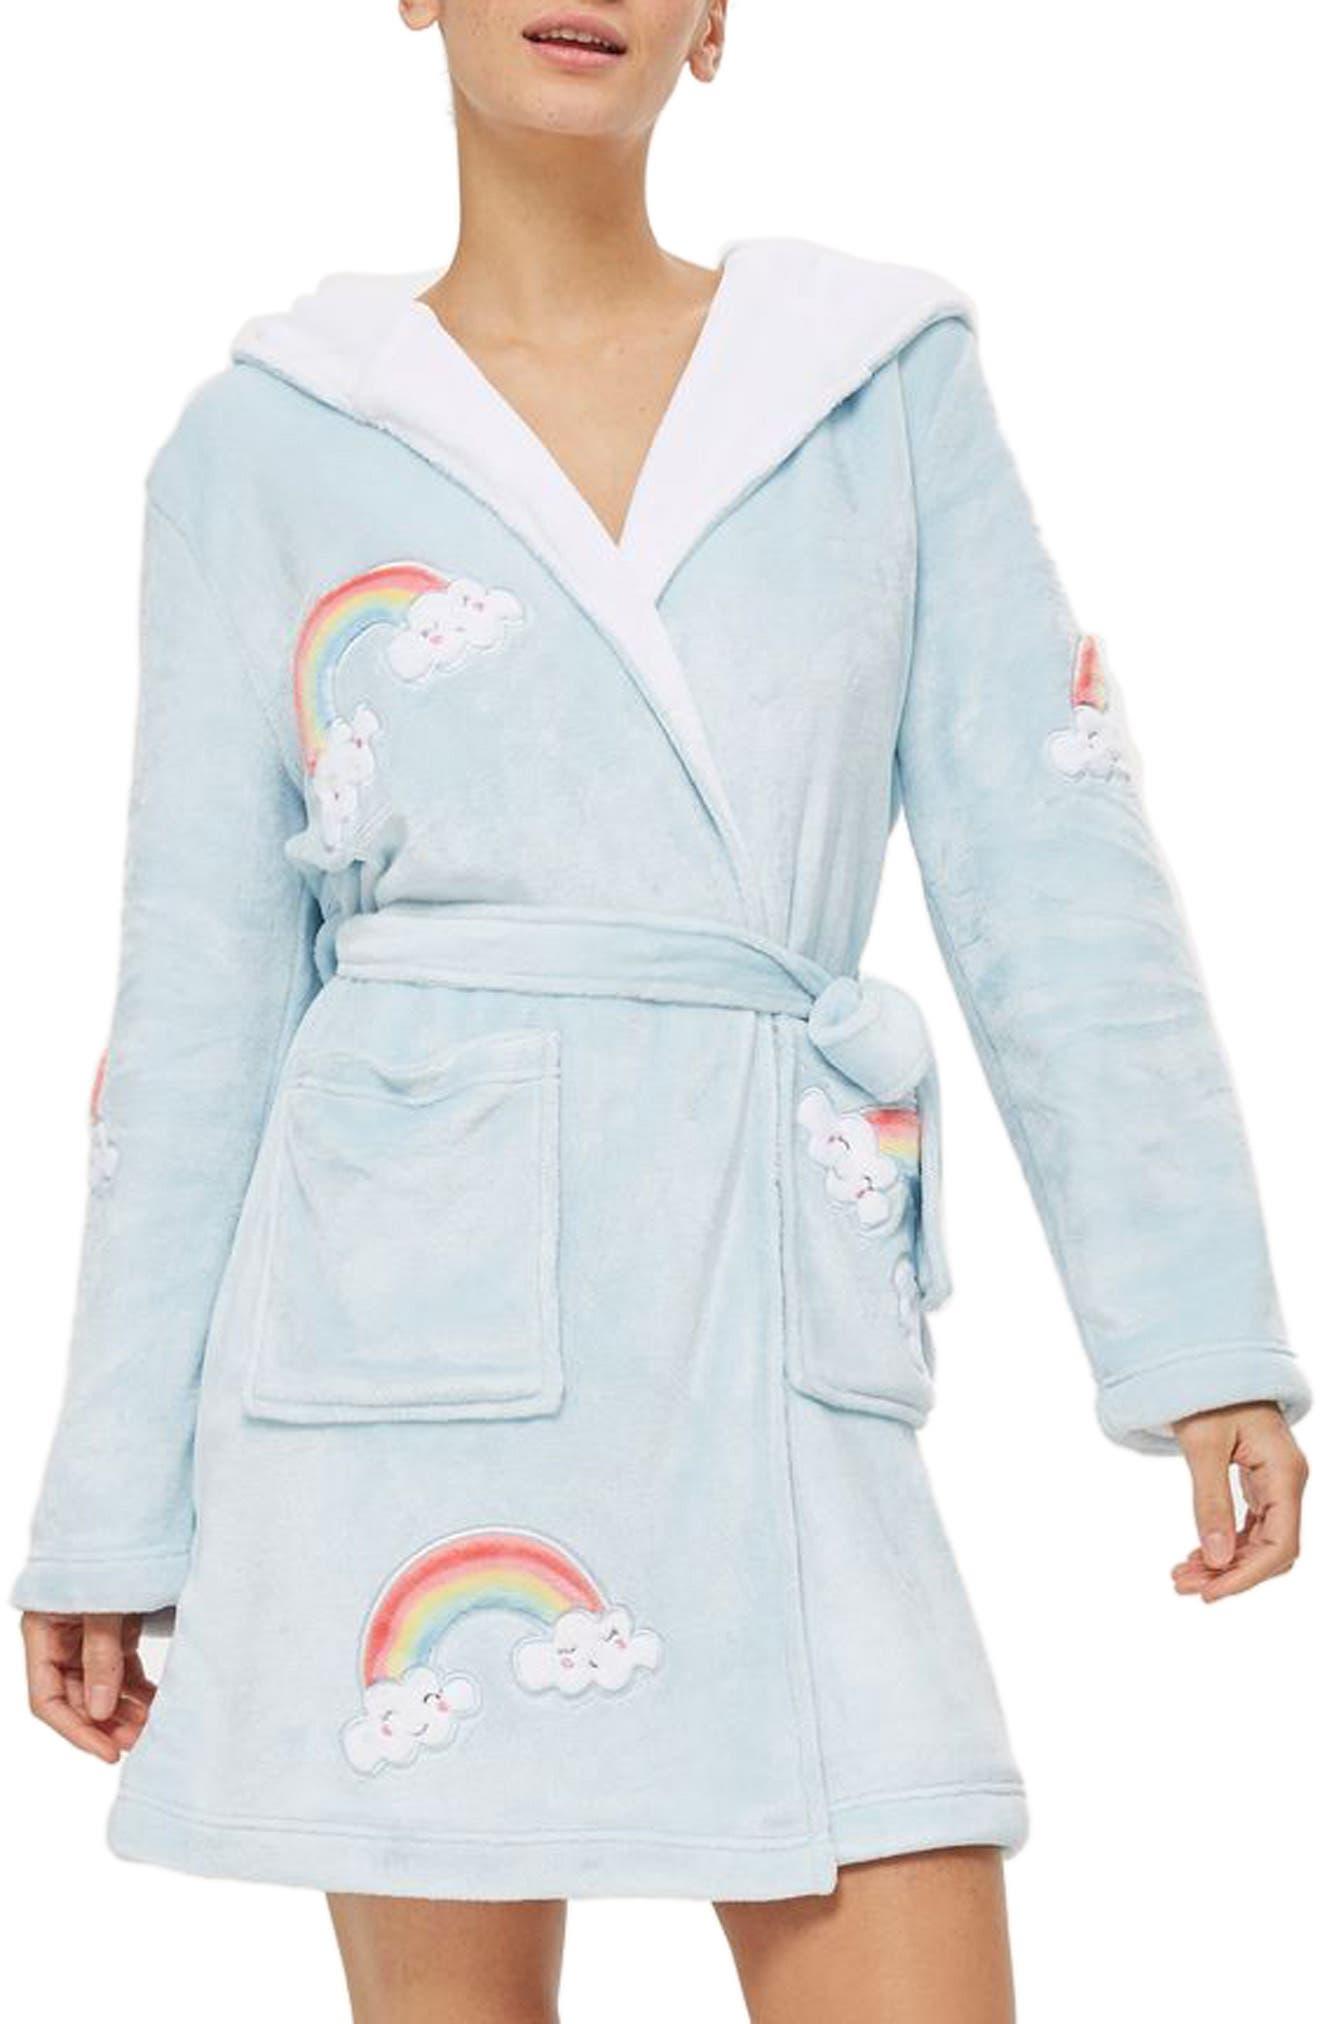 Topshop Rainbow Dressing Robe